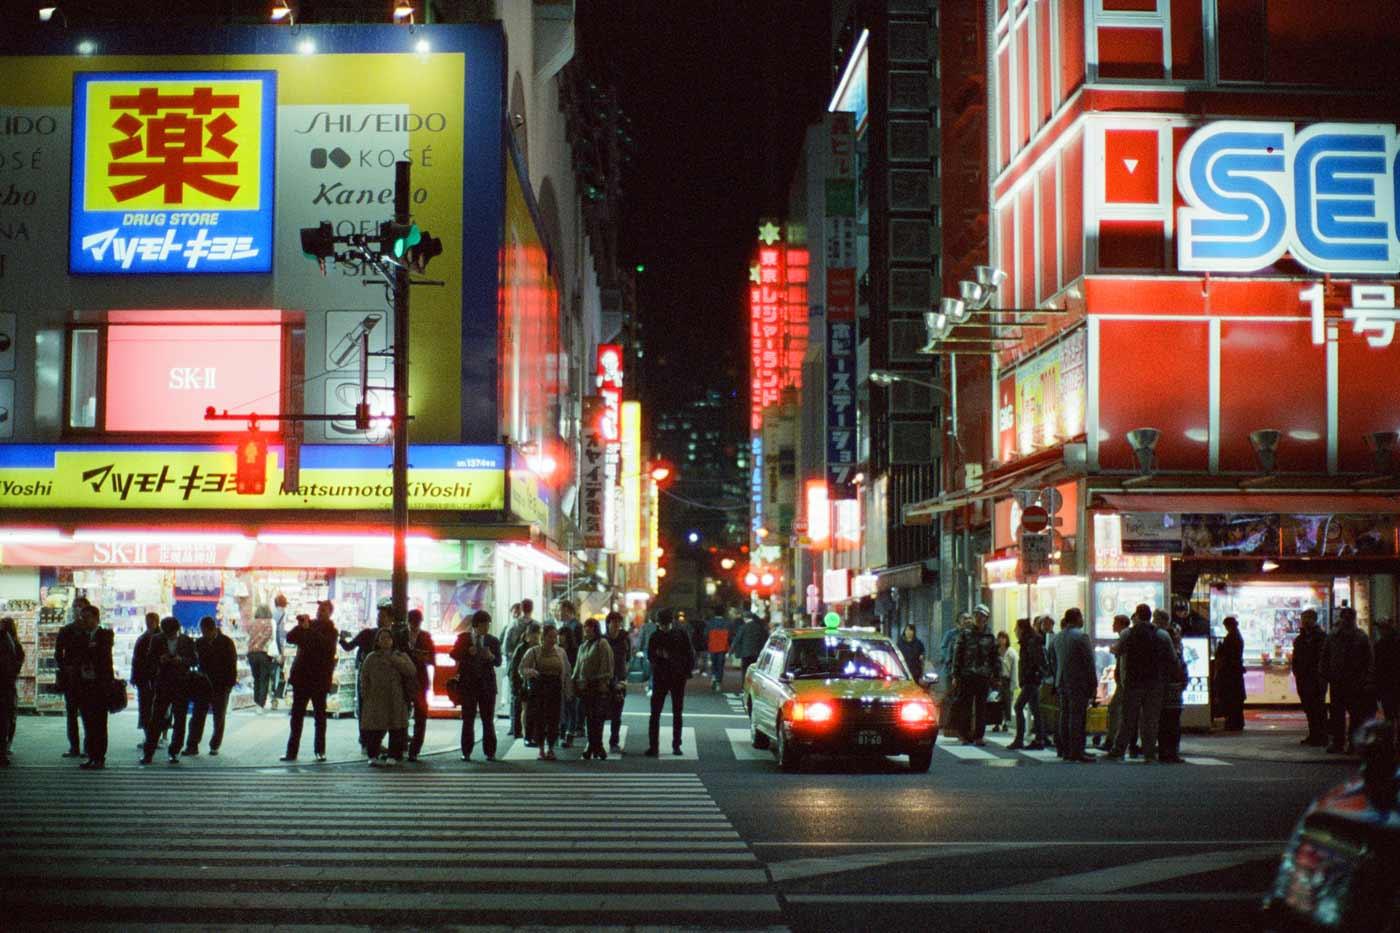 top-5-five-colour-color-negative-films-film-start-try-must-best-c41-guide-list-cinestill-remjet-ecn2-cine-akihabara-japan-tokyo-night-noctilux-v4-halo-red-800t-tungsten